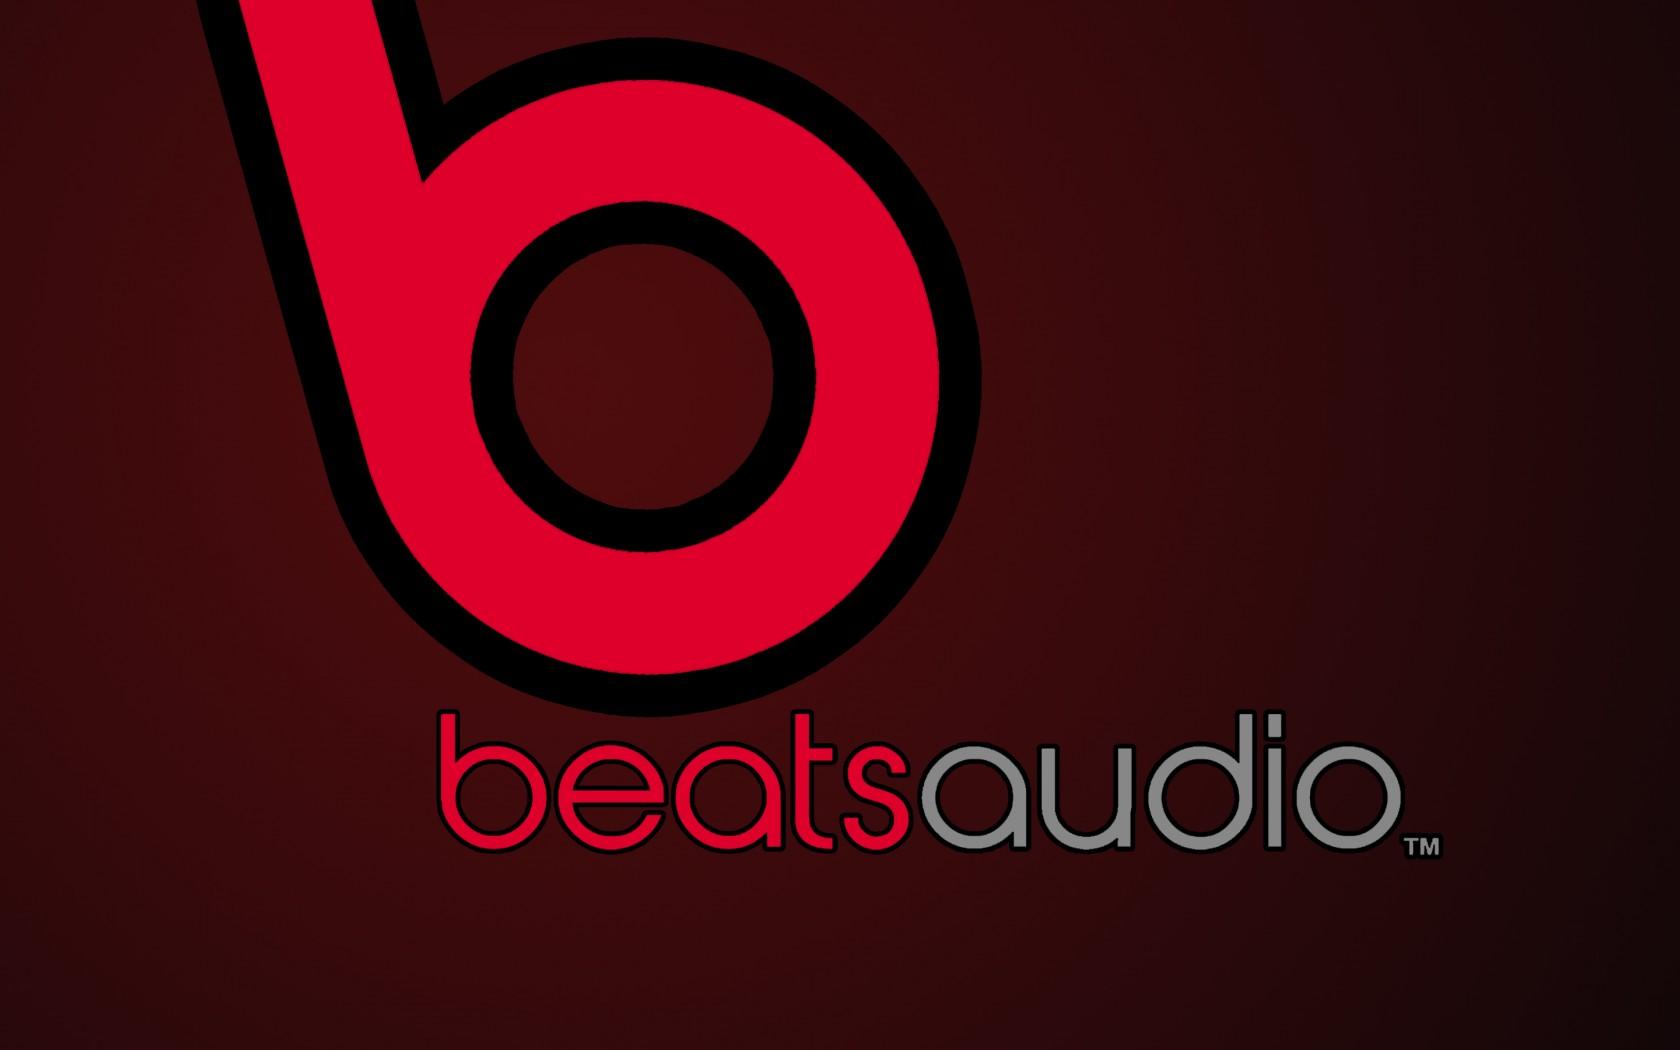 Beats Audio Logo | 1680 x 1050 ...